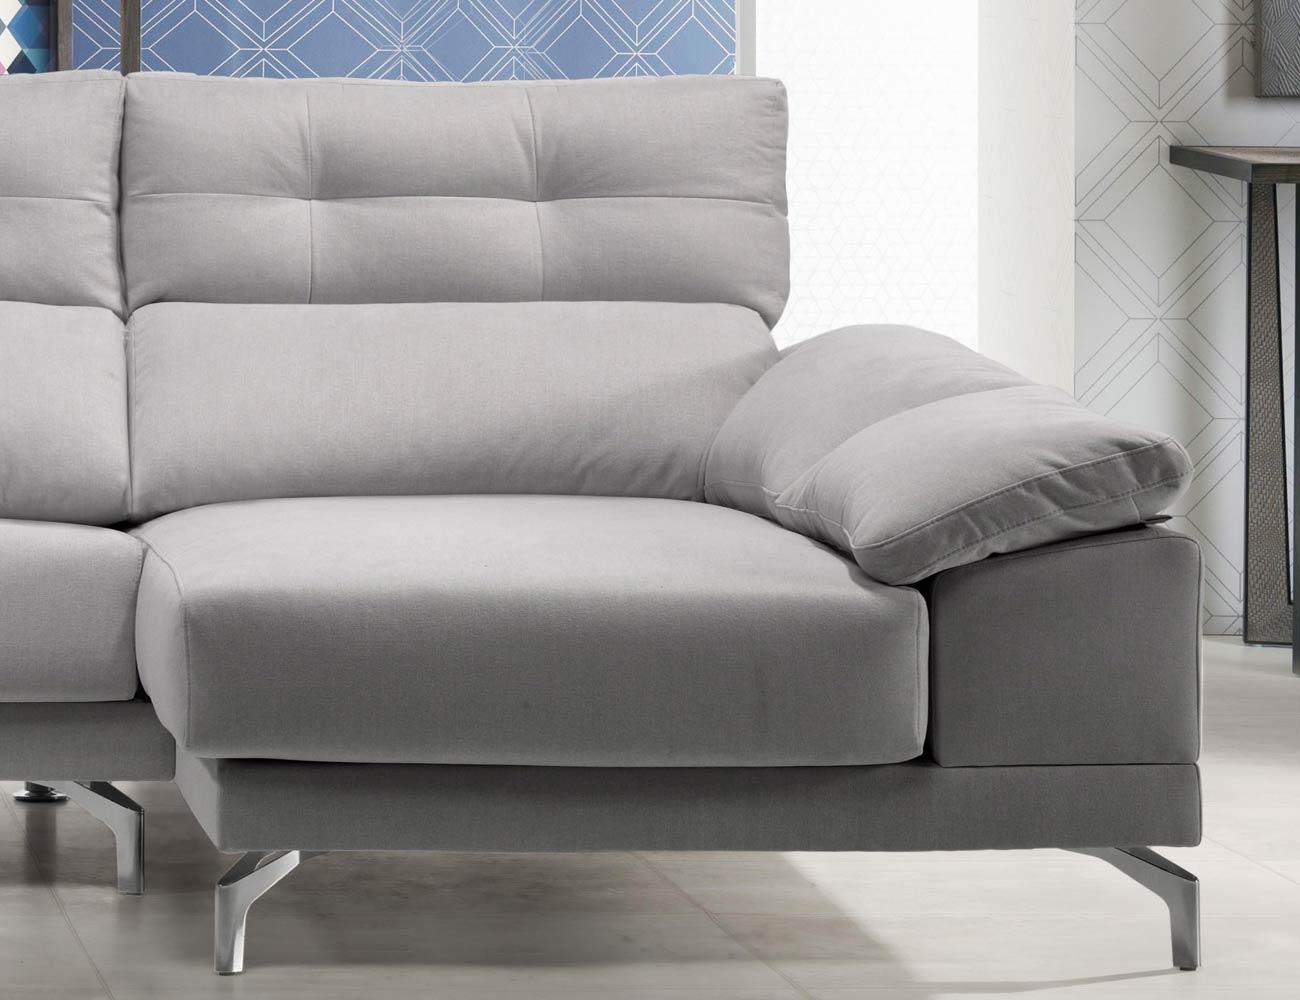 Sofa chaiselongue 21